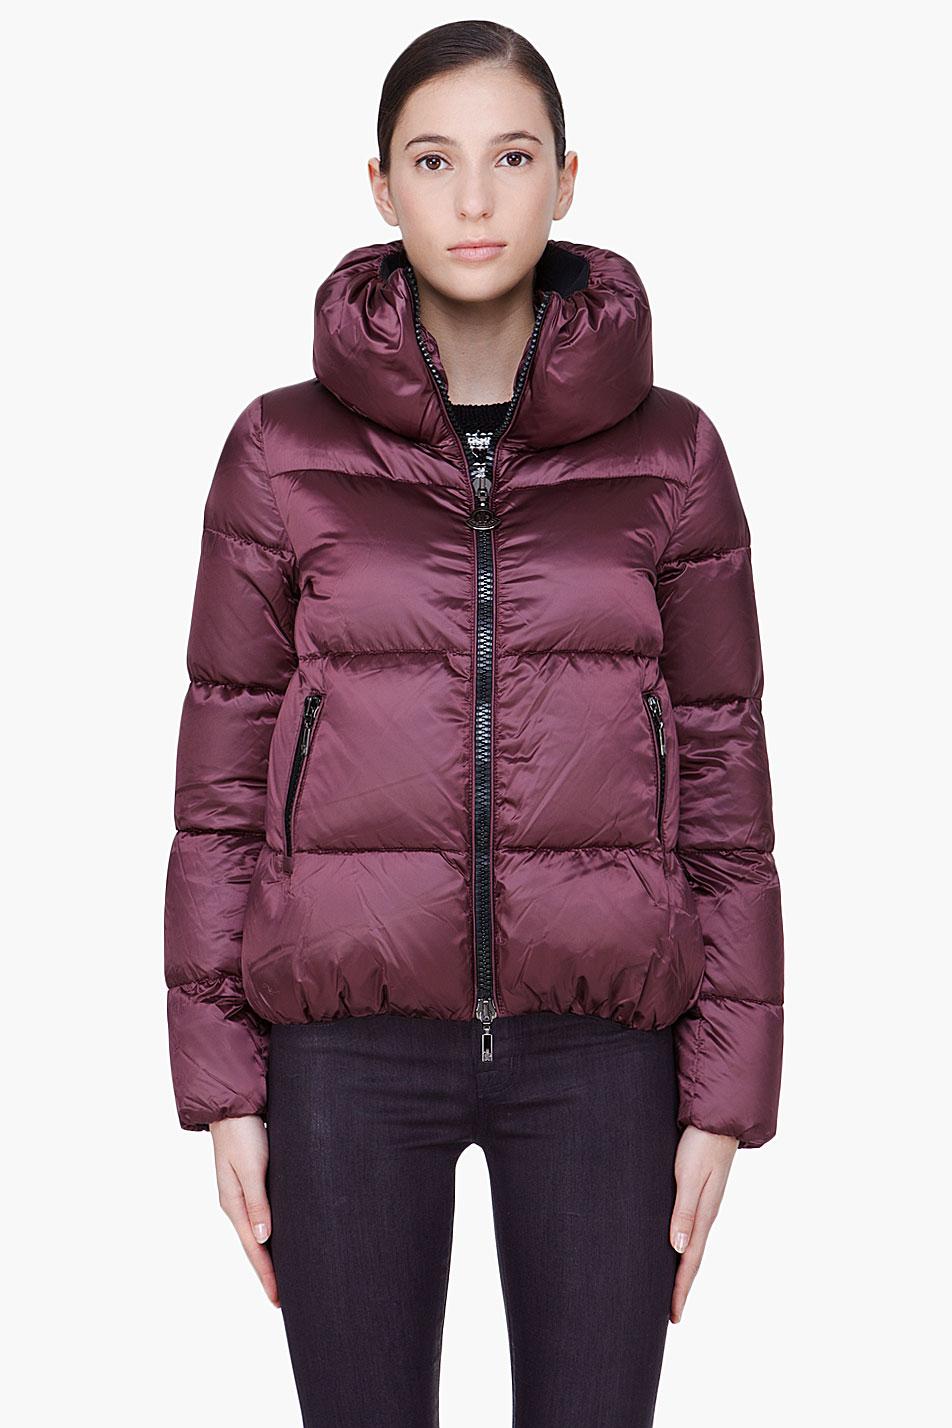 Lyst moncler burgundy padded erable jacket in purple